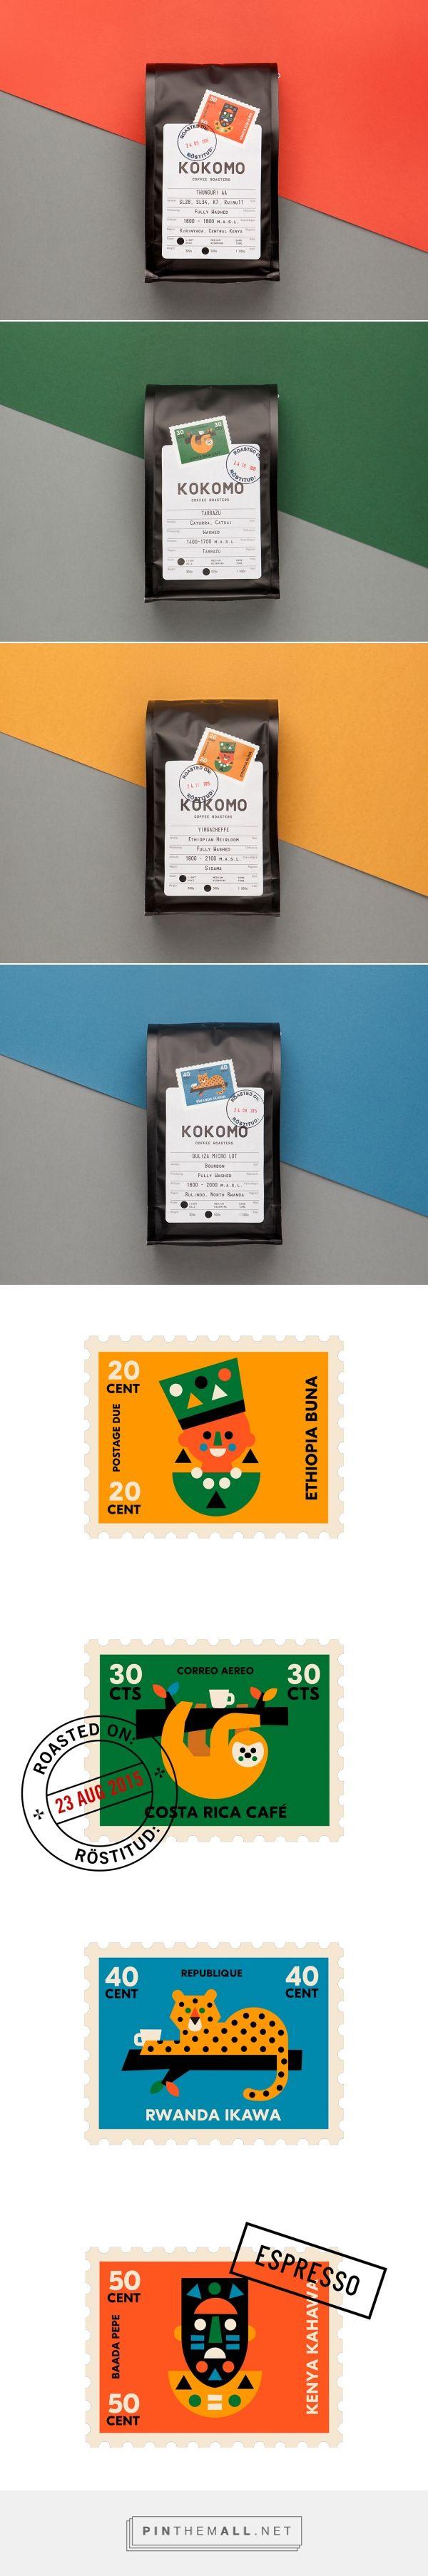 Kokomo Coffee packaging design by AKU (Estonia) - http://www.packagingoftheworld.com/2016/09/kokomo-coffee.html